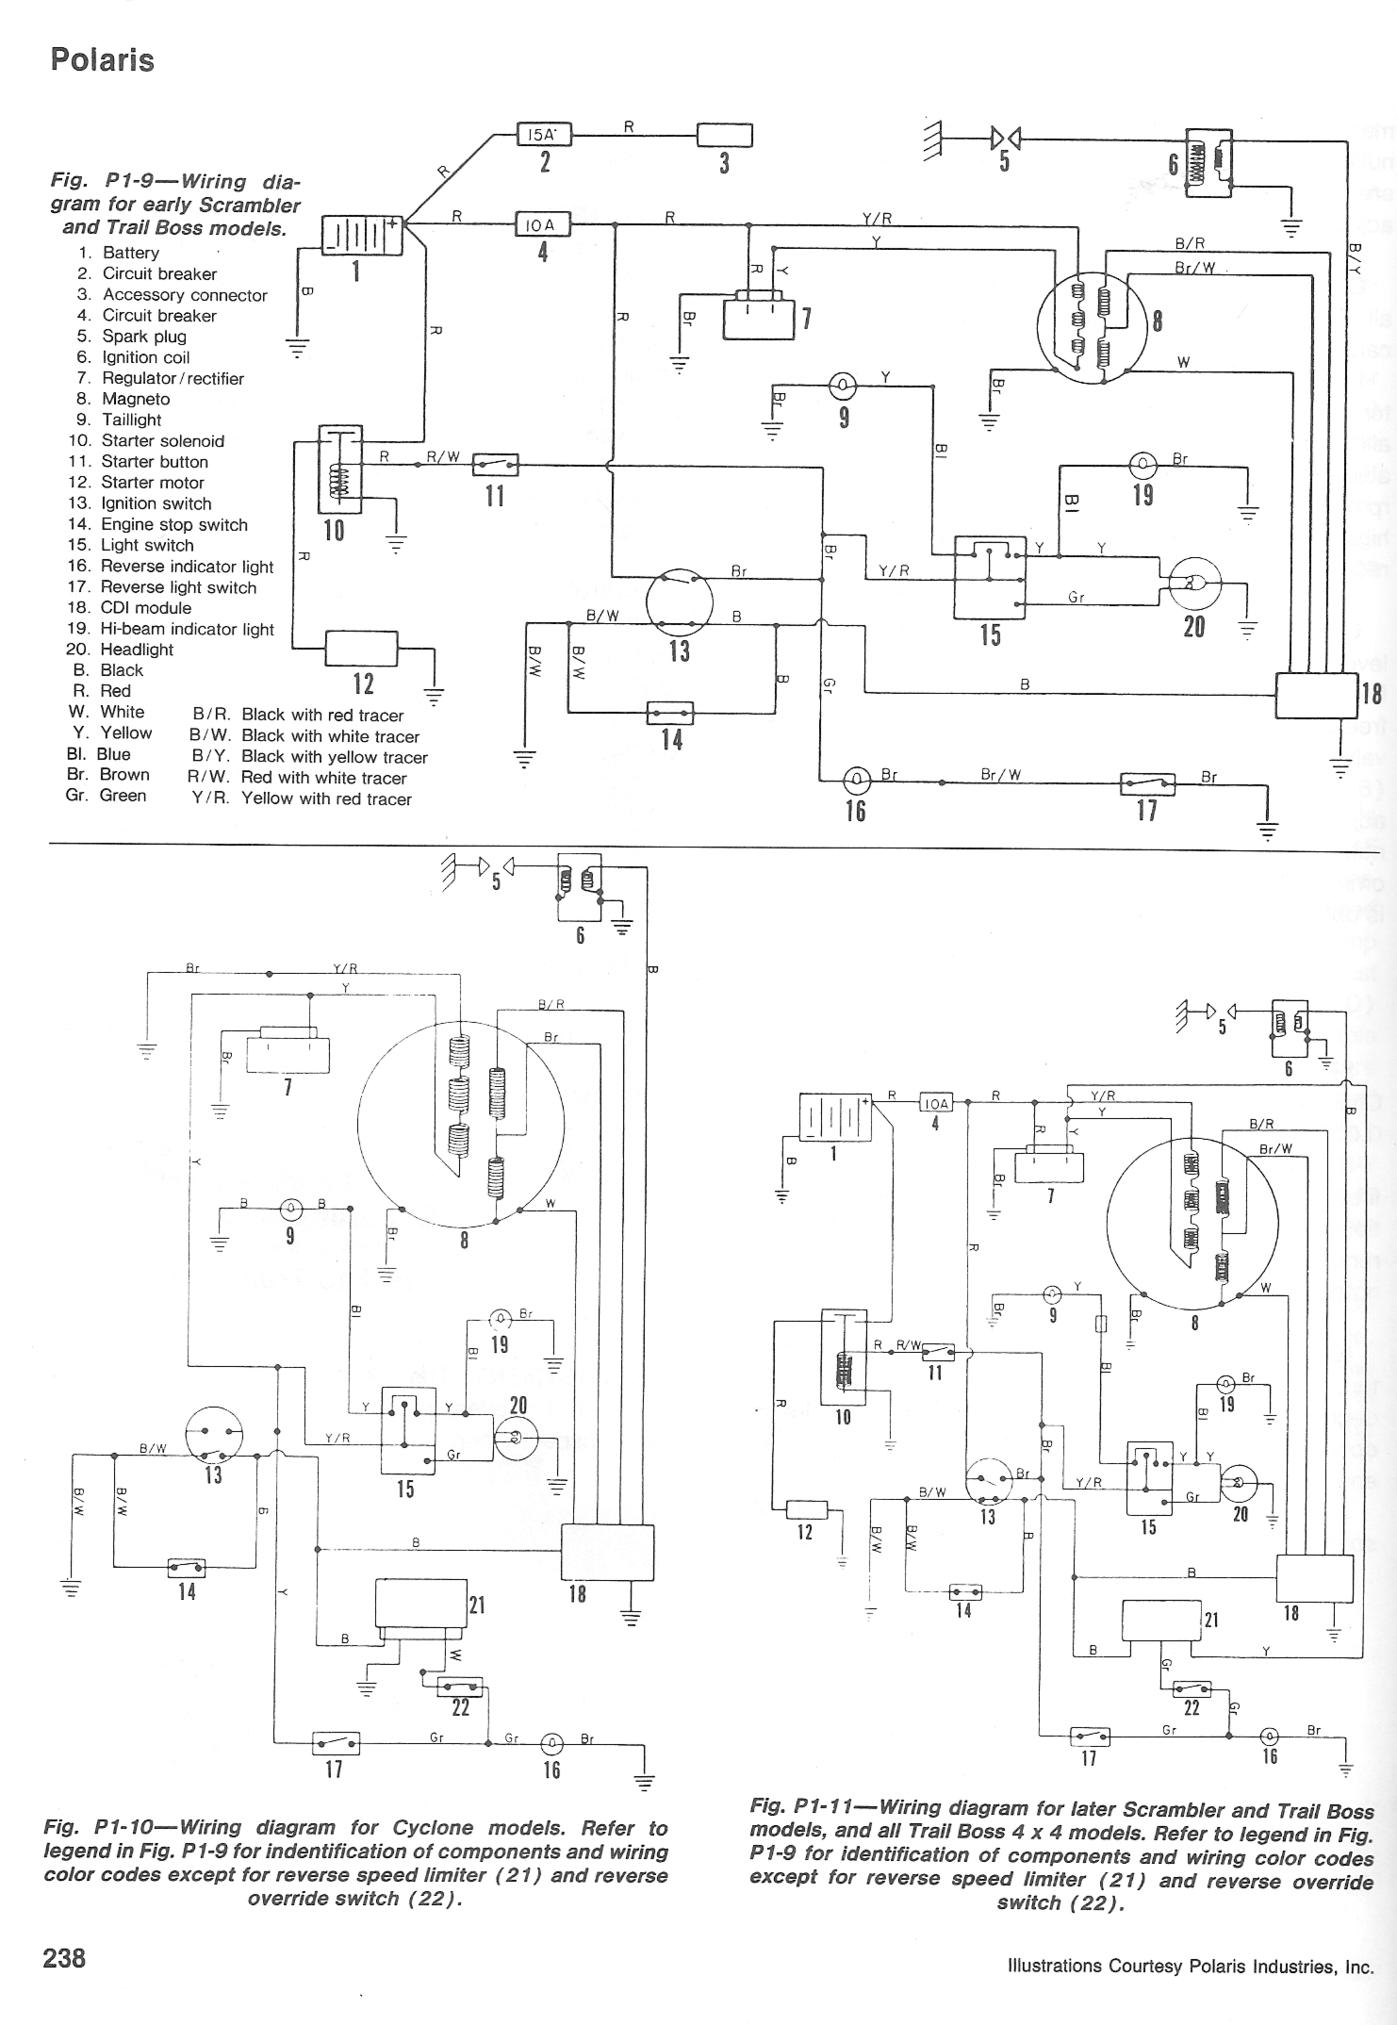 Cool xtreme 90cc atv wiring diagram ideas electrical and wiring xtreme 90cc atv wiring diagram 50cc scooter wiring diagram 5 way cheapraybanclubmaster Gallery